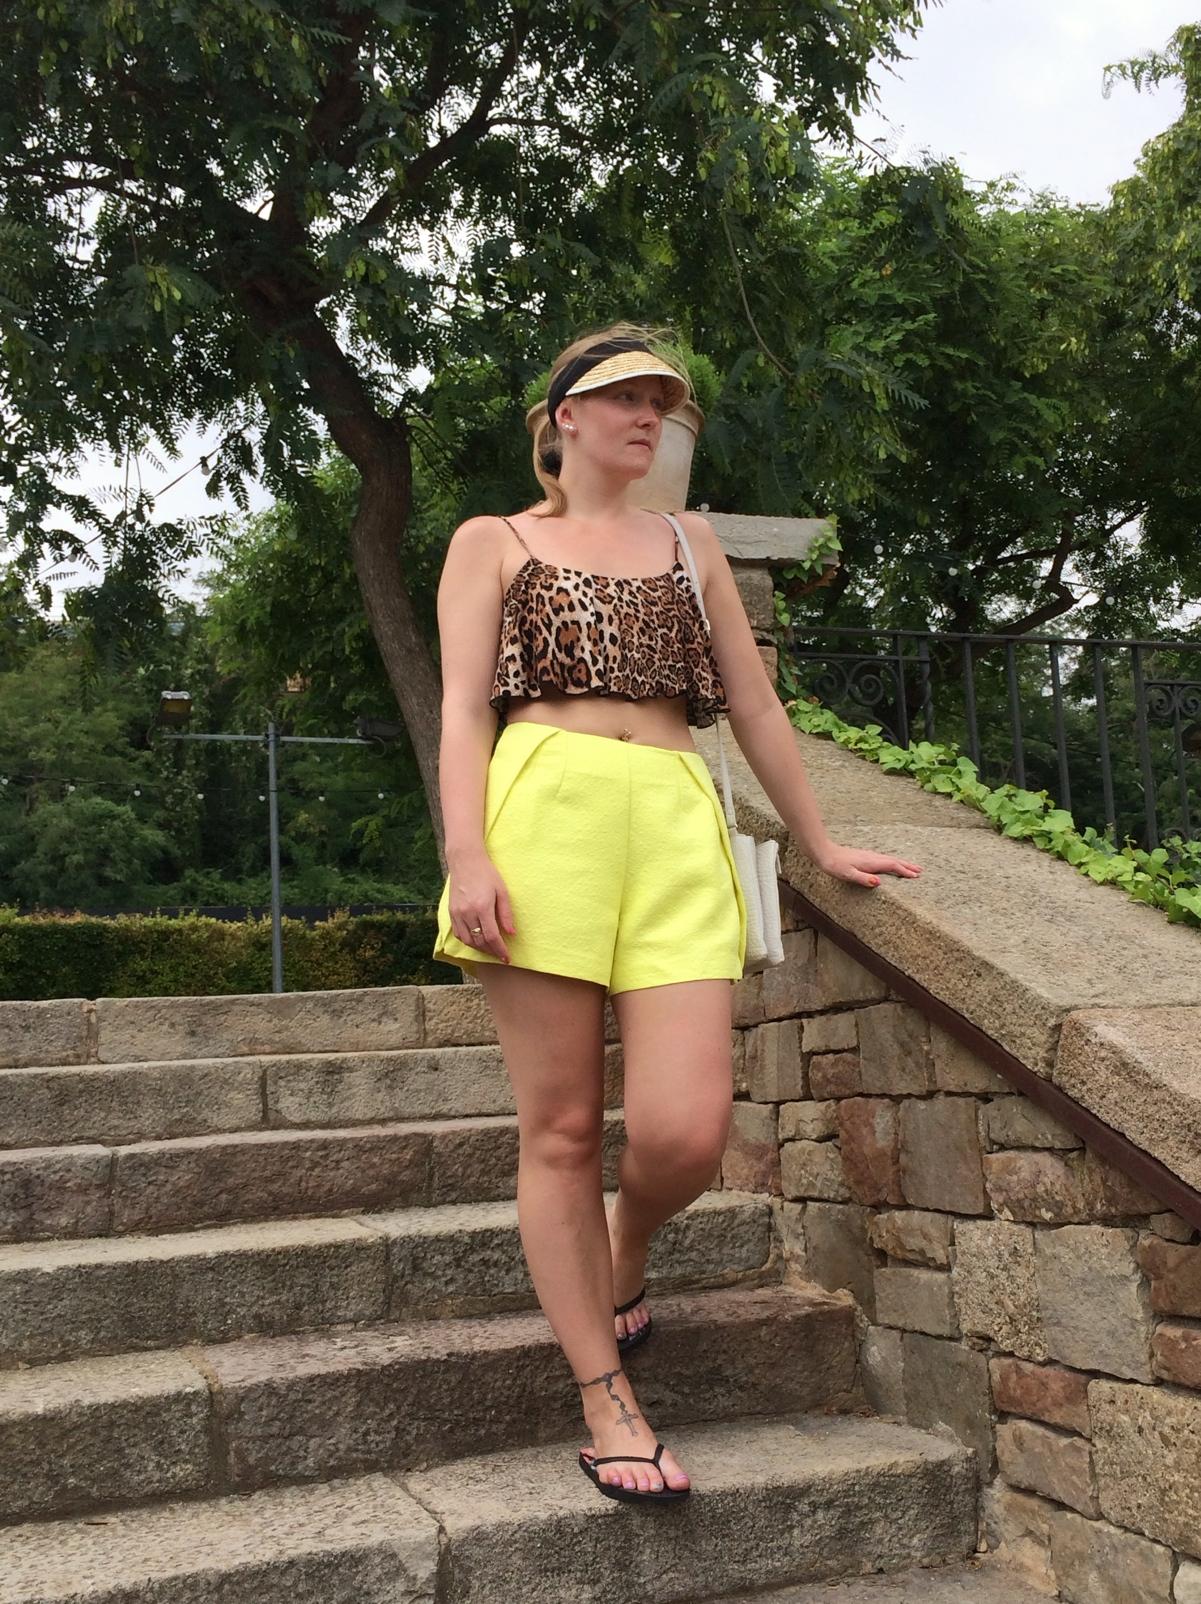 Asos-yellow-shorts-leopard-crop-visor